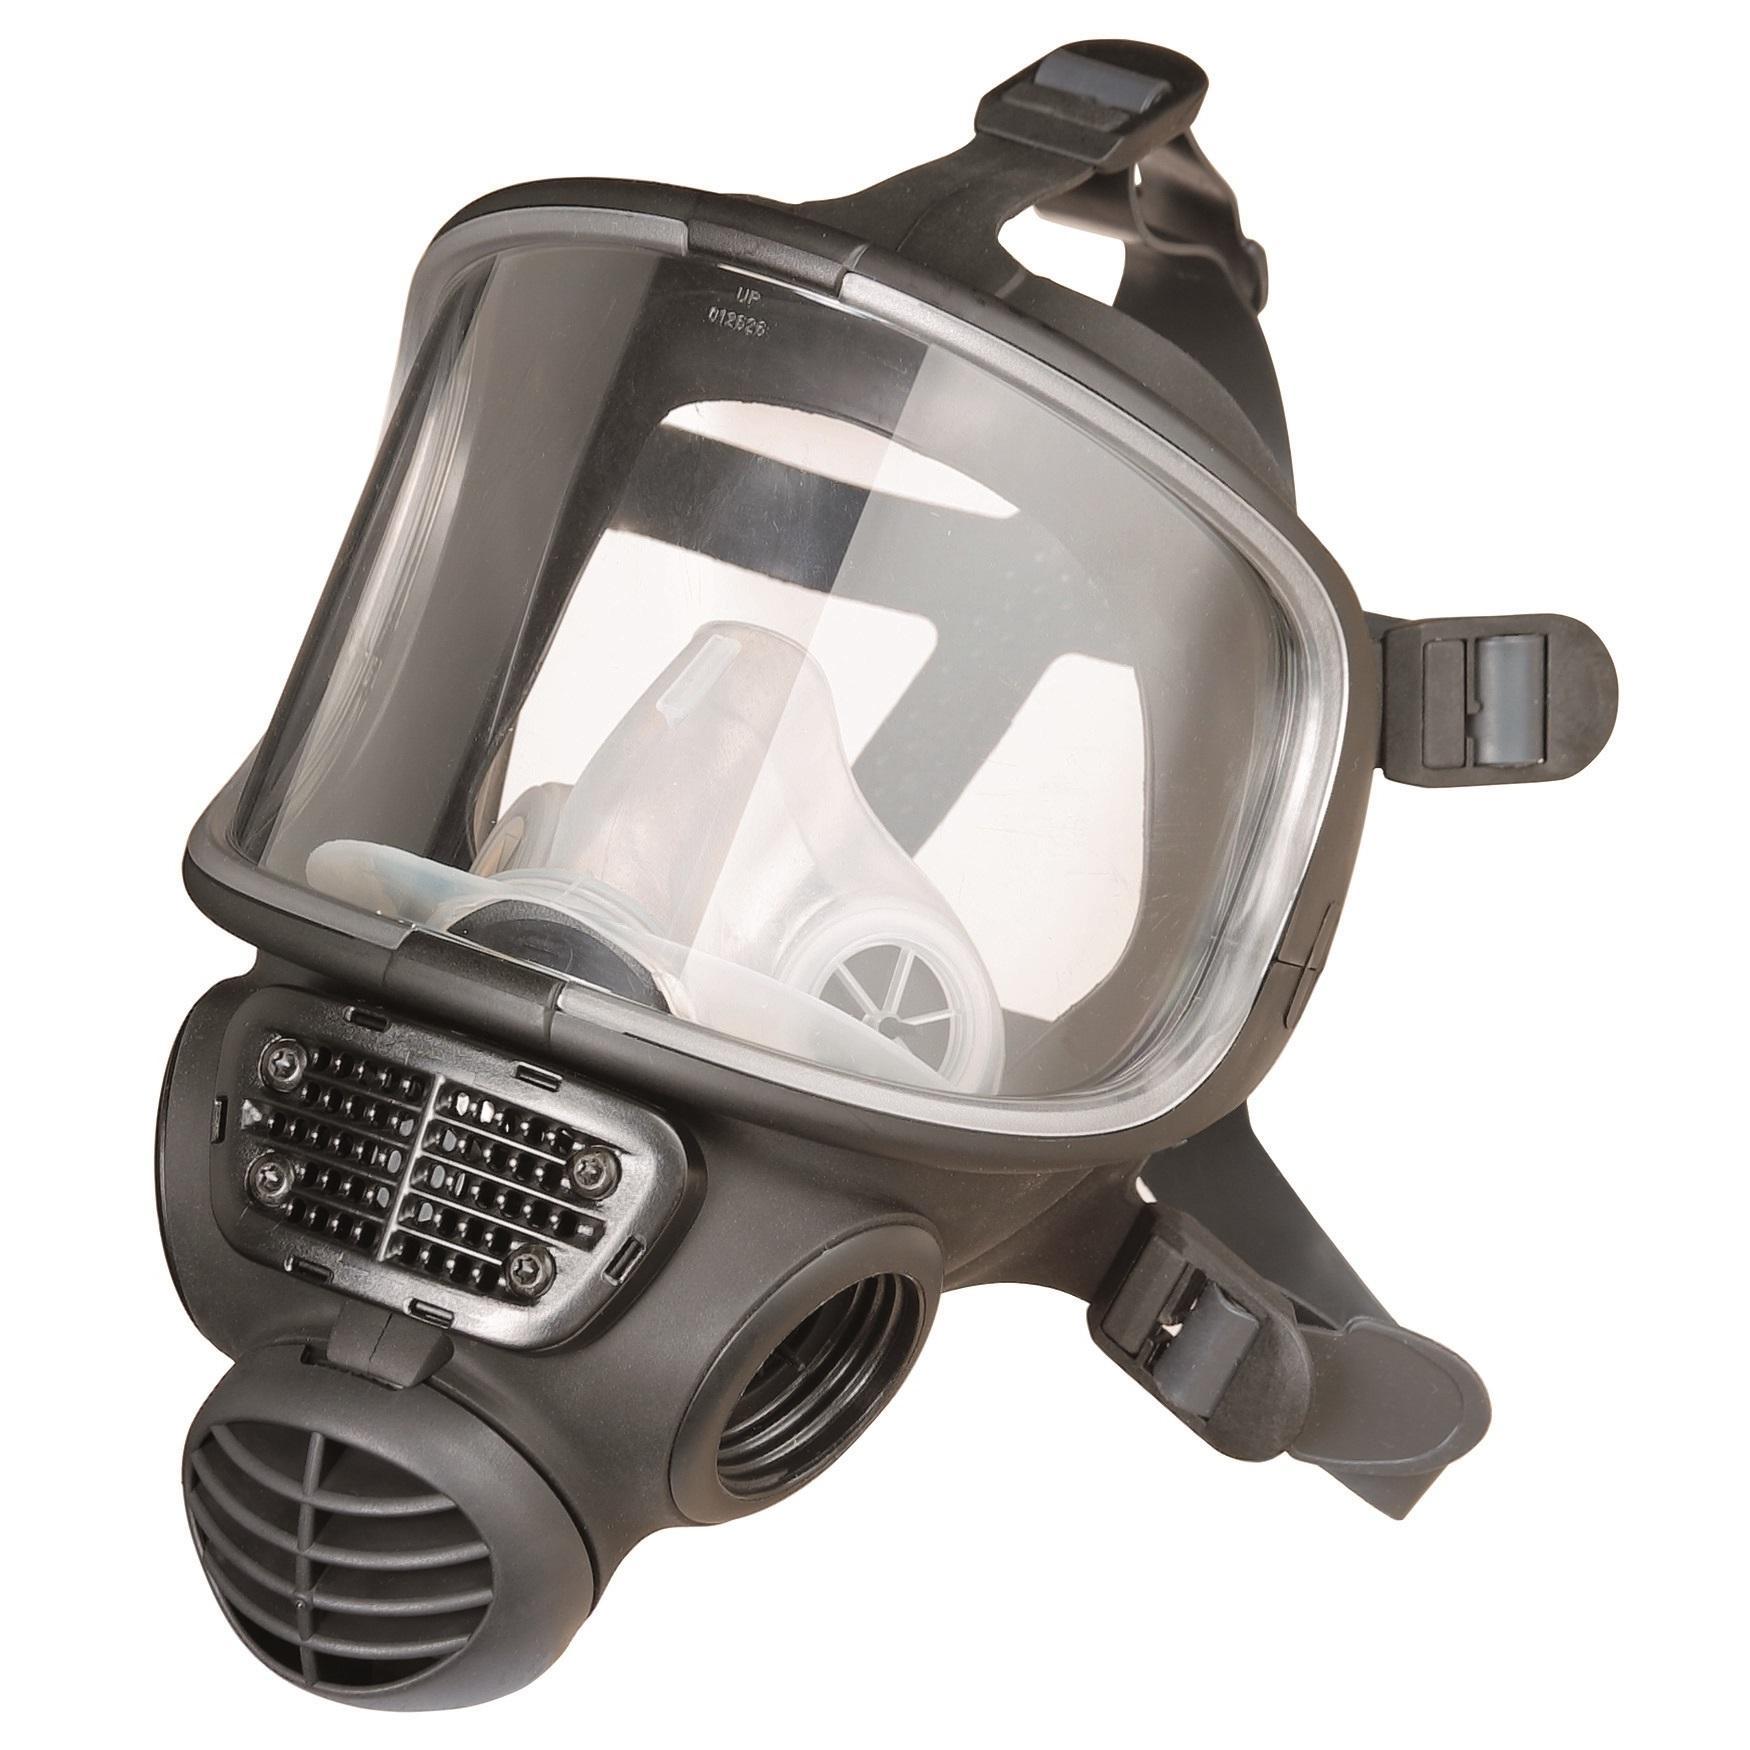 Scott Safety Promask Full Face Respirator